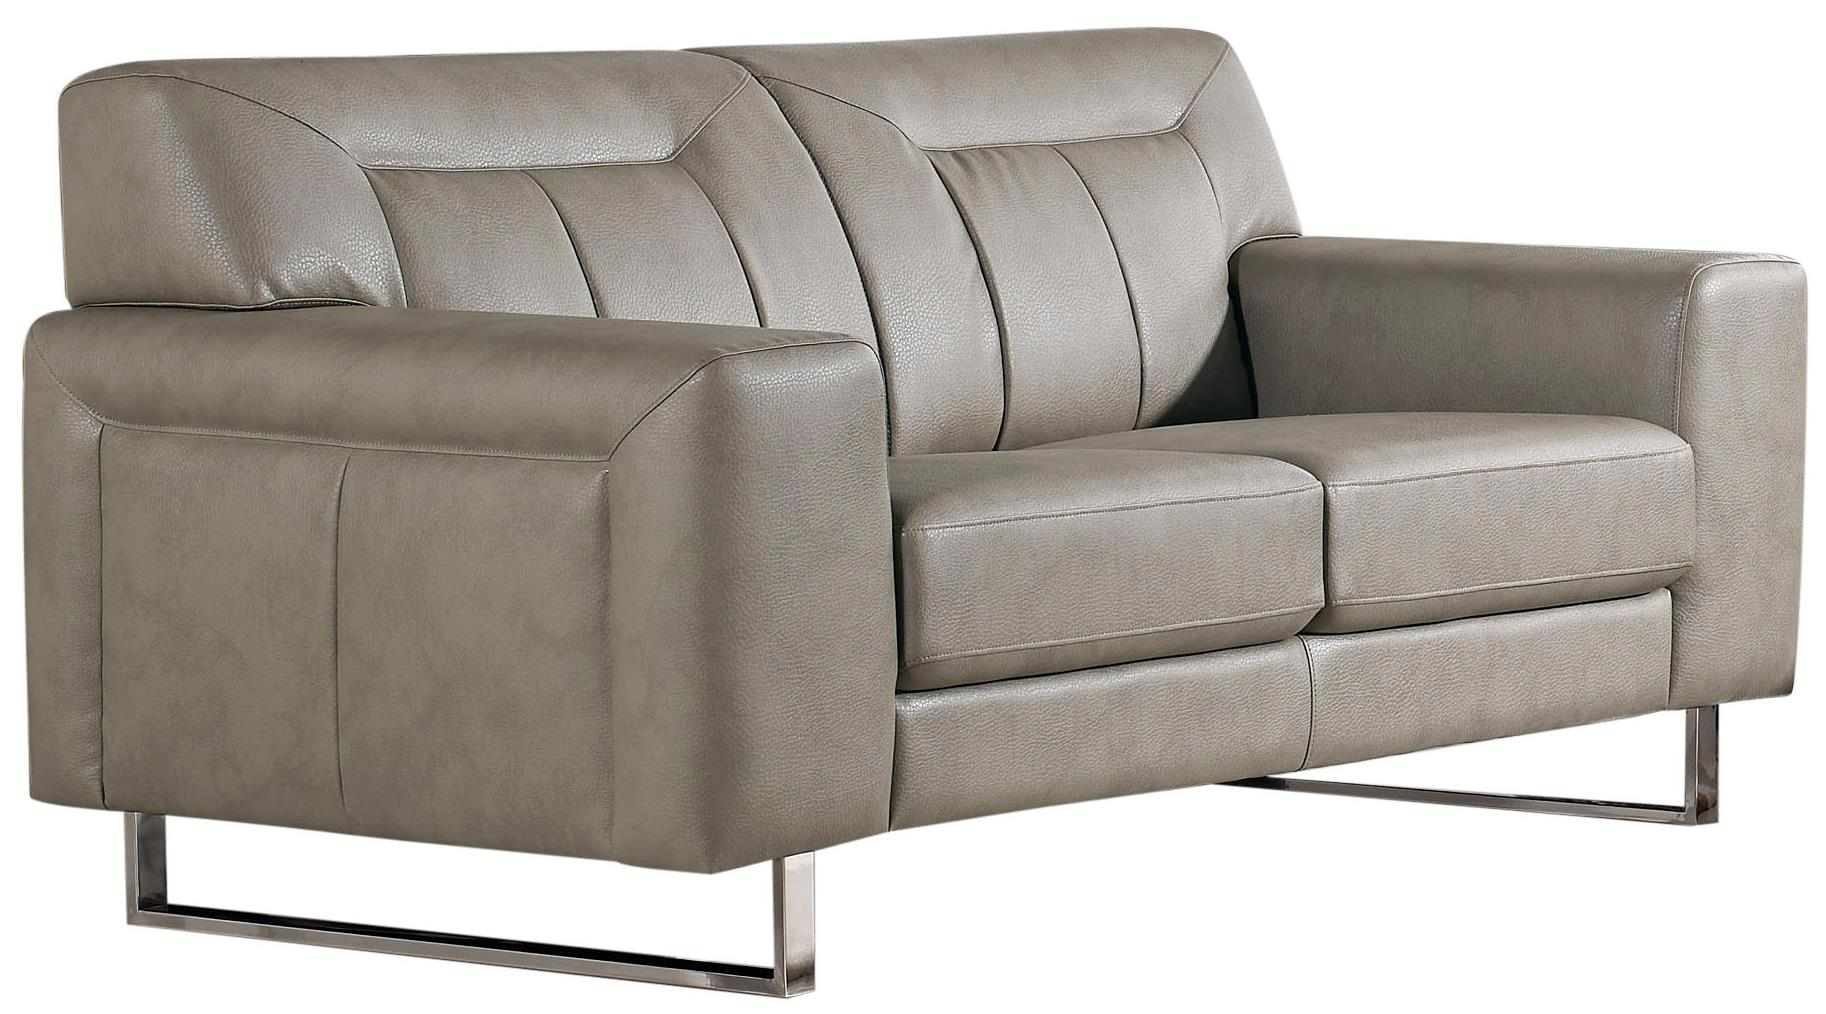 Diamond Sofa Vera Leatherette Loveseat with Chrome Metal Leg - Item Number: VERALOSS